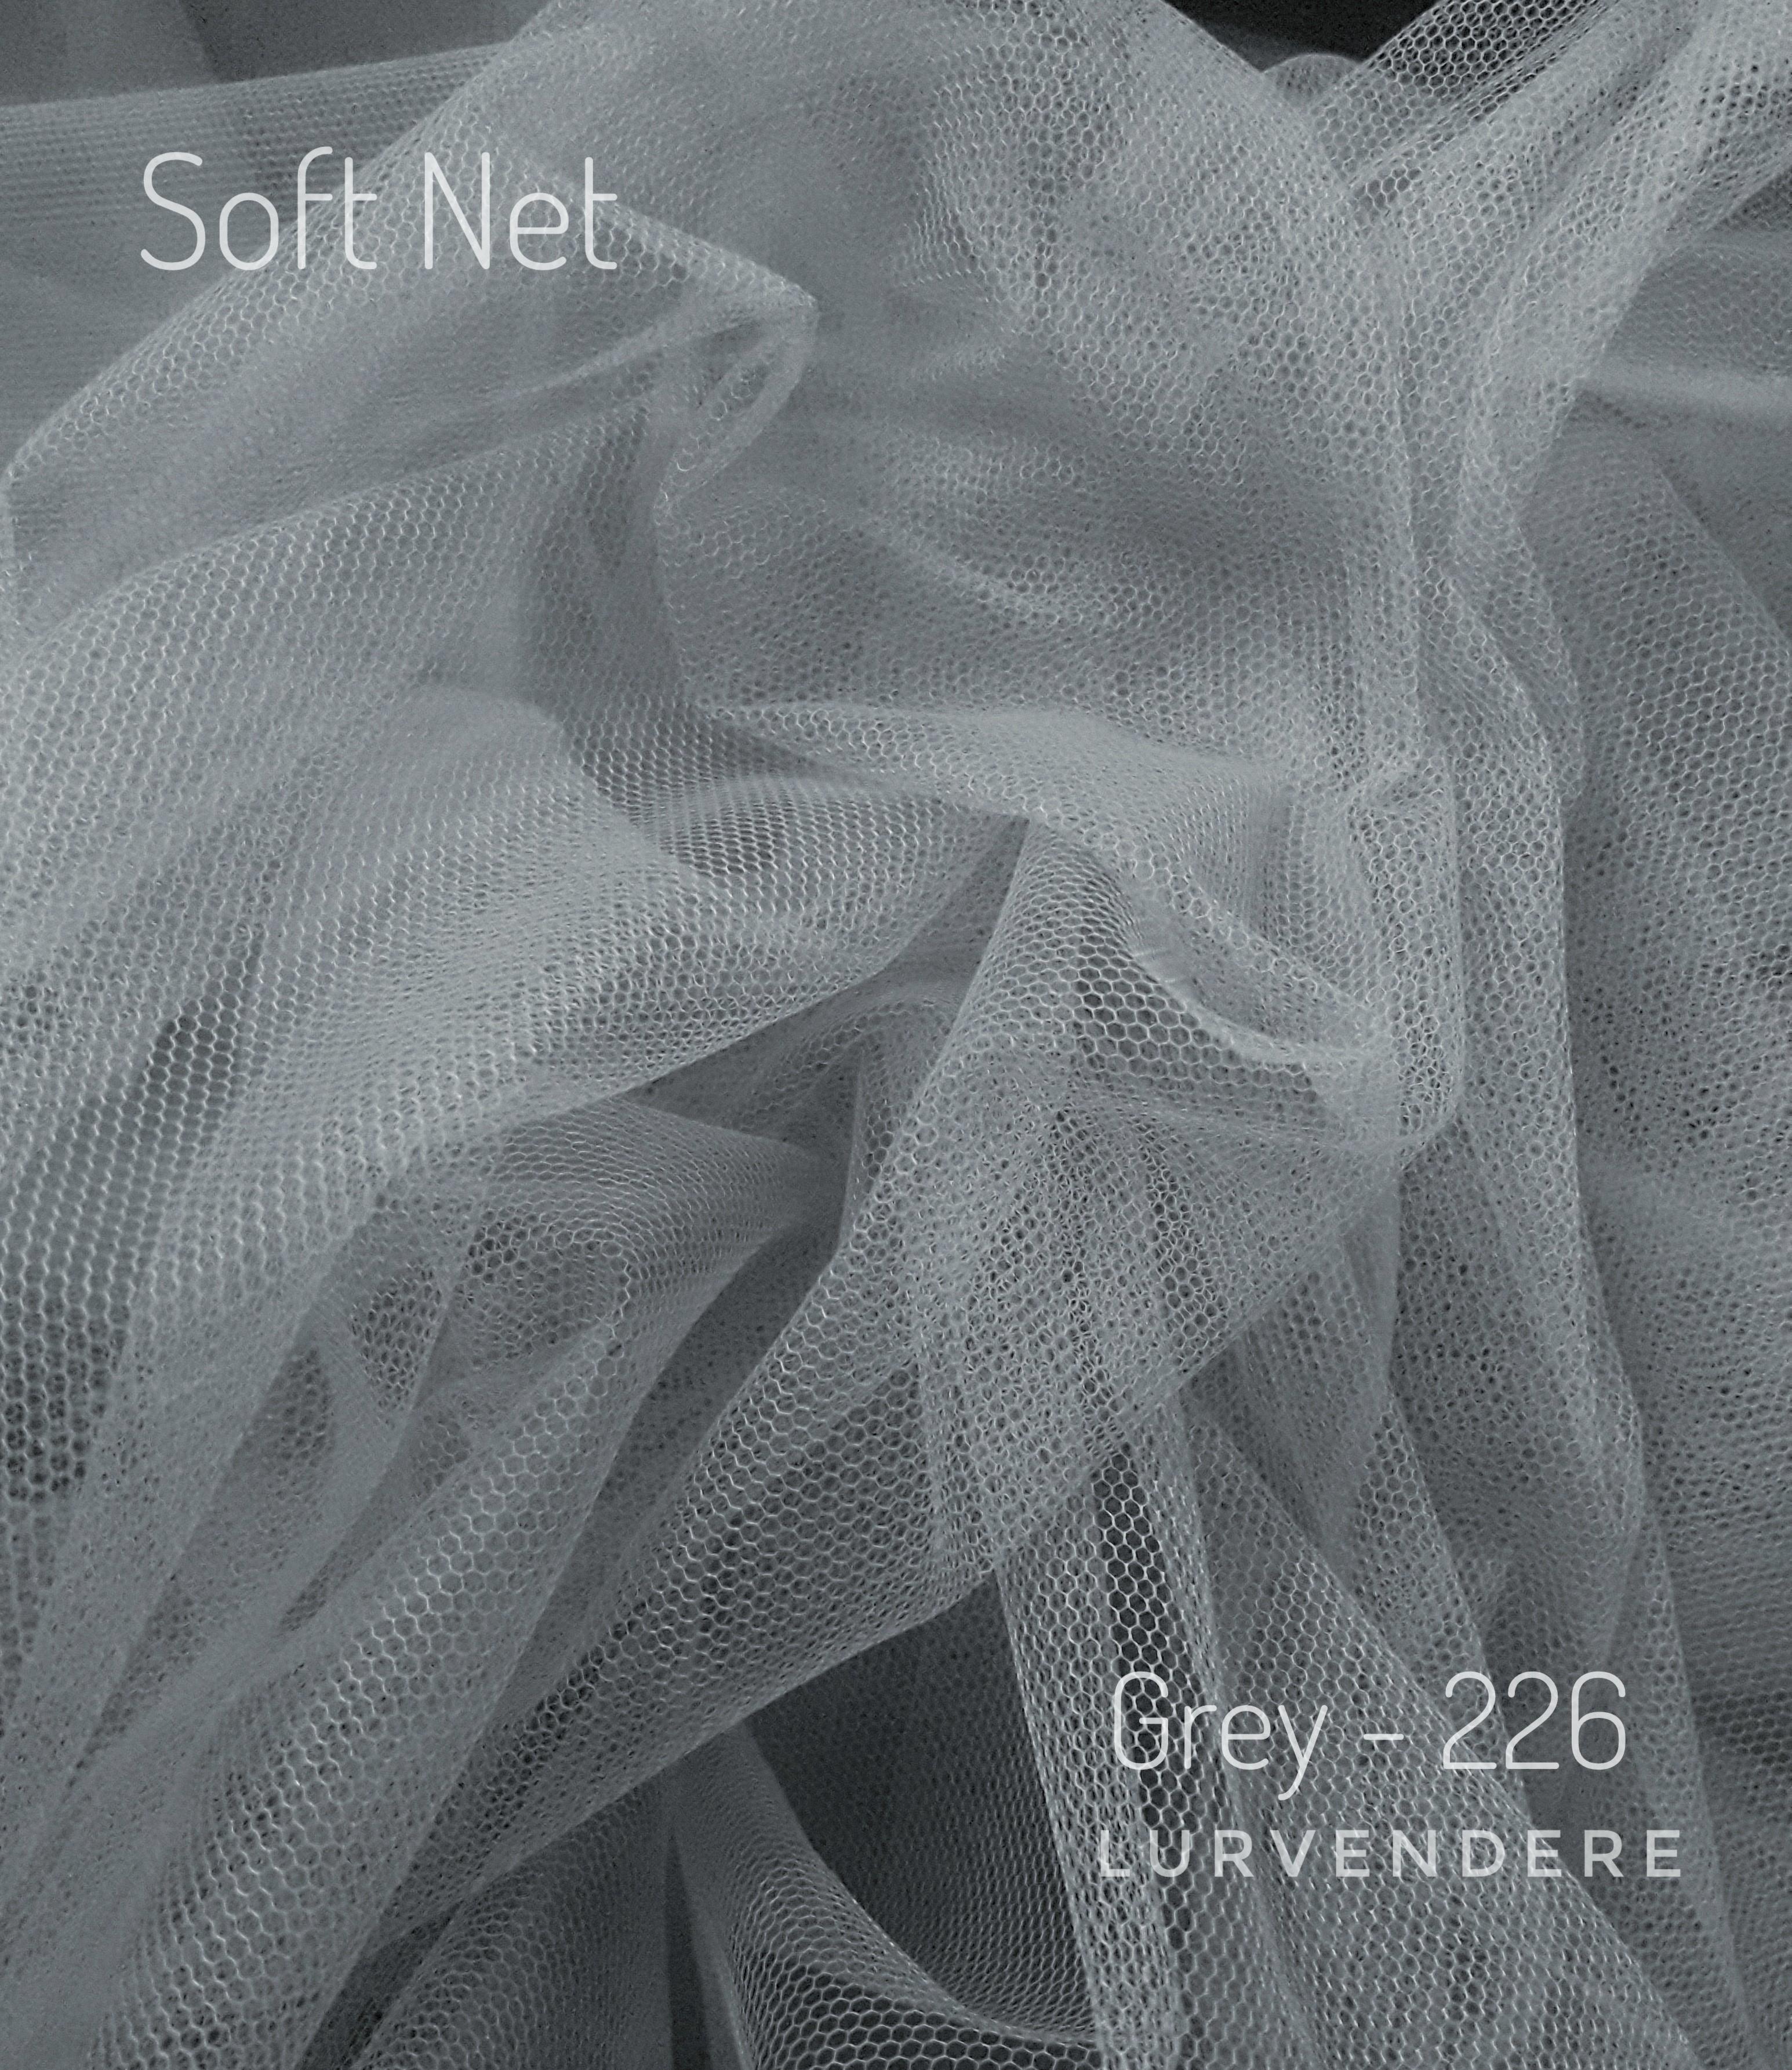 Soft Net - Grey ( 226 )